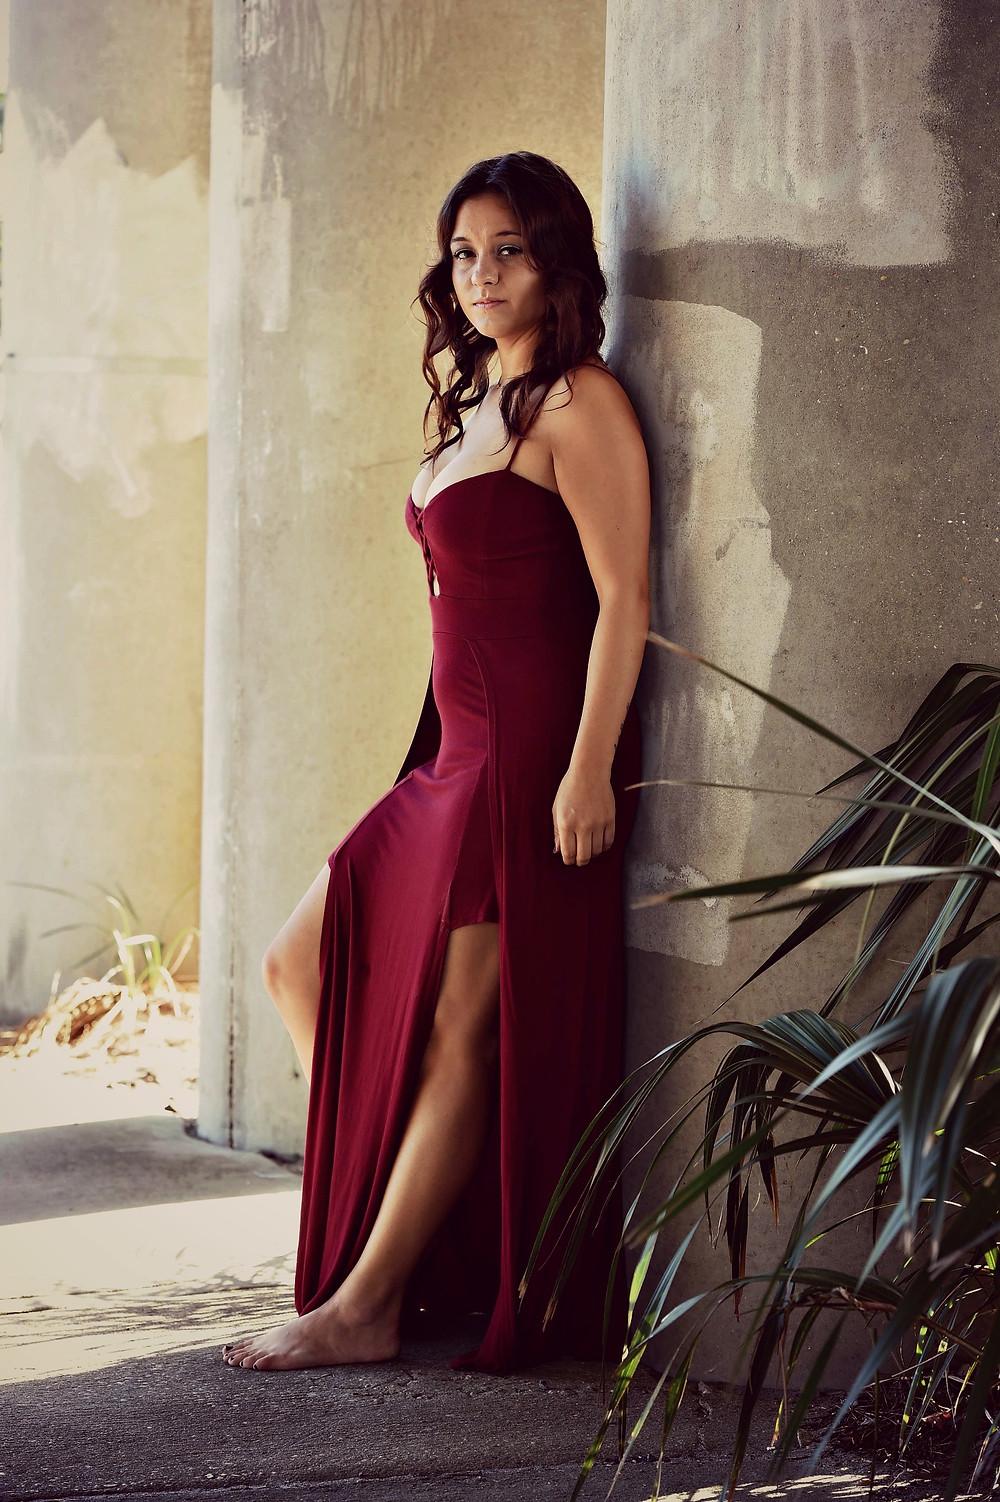 A fashion blogger wears an oxblood maxi dress with a side slit.